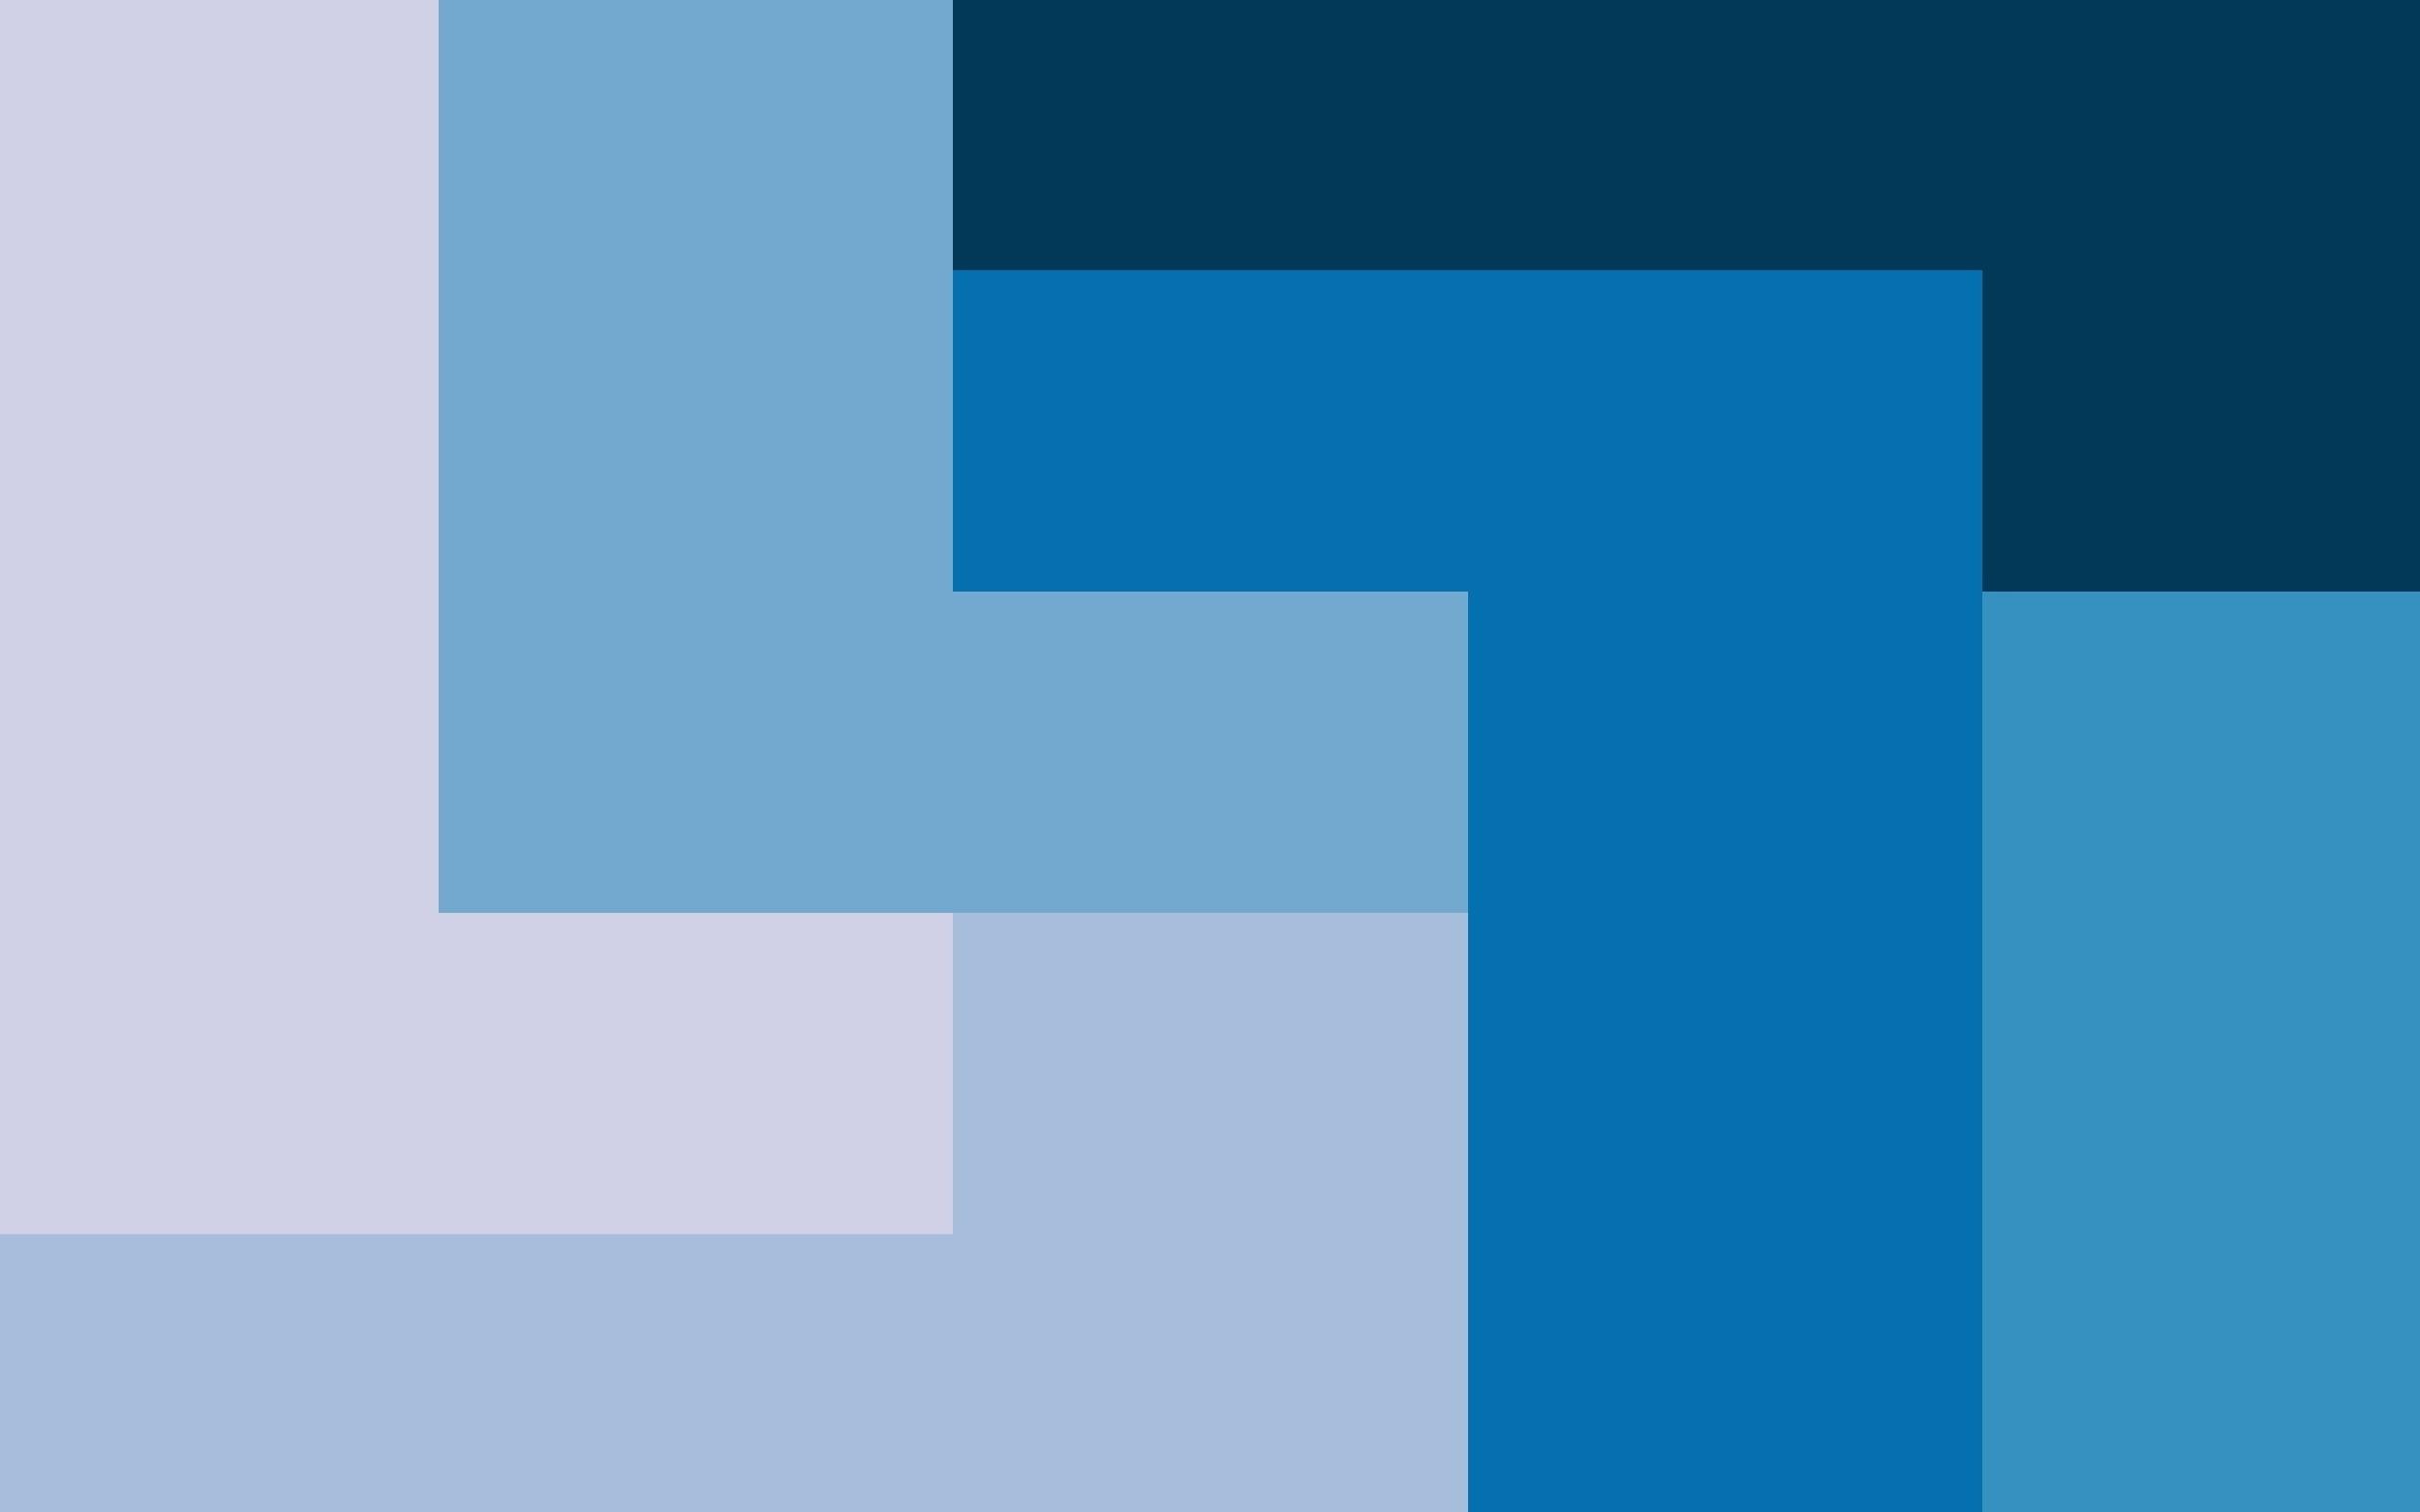 16 Luxury Pubg Wallpaper Iphone 6: 壁紙 青い形の線 2560x1600 HD 無料のデスクトップの背景, 画像